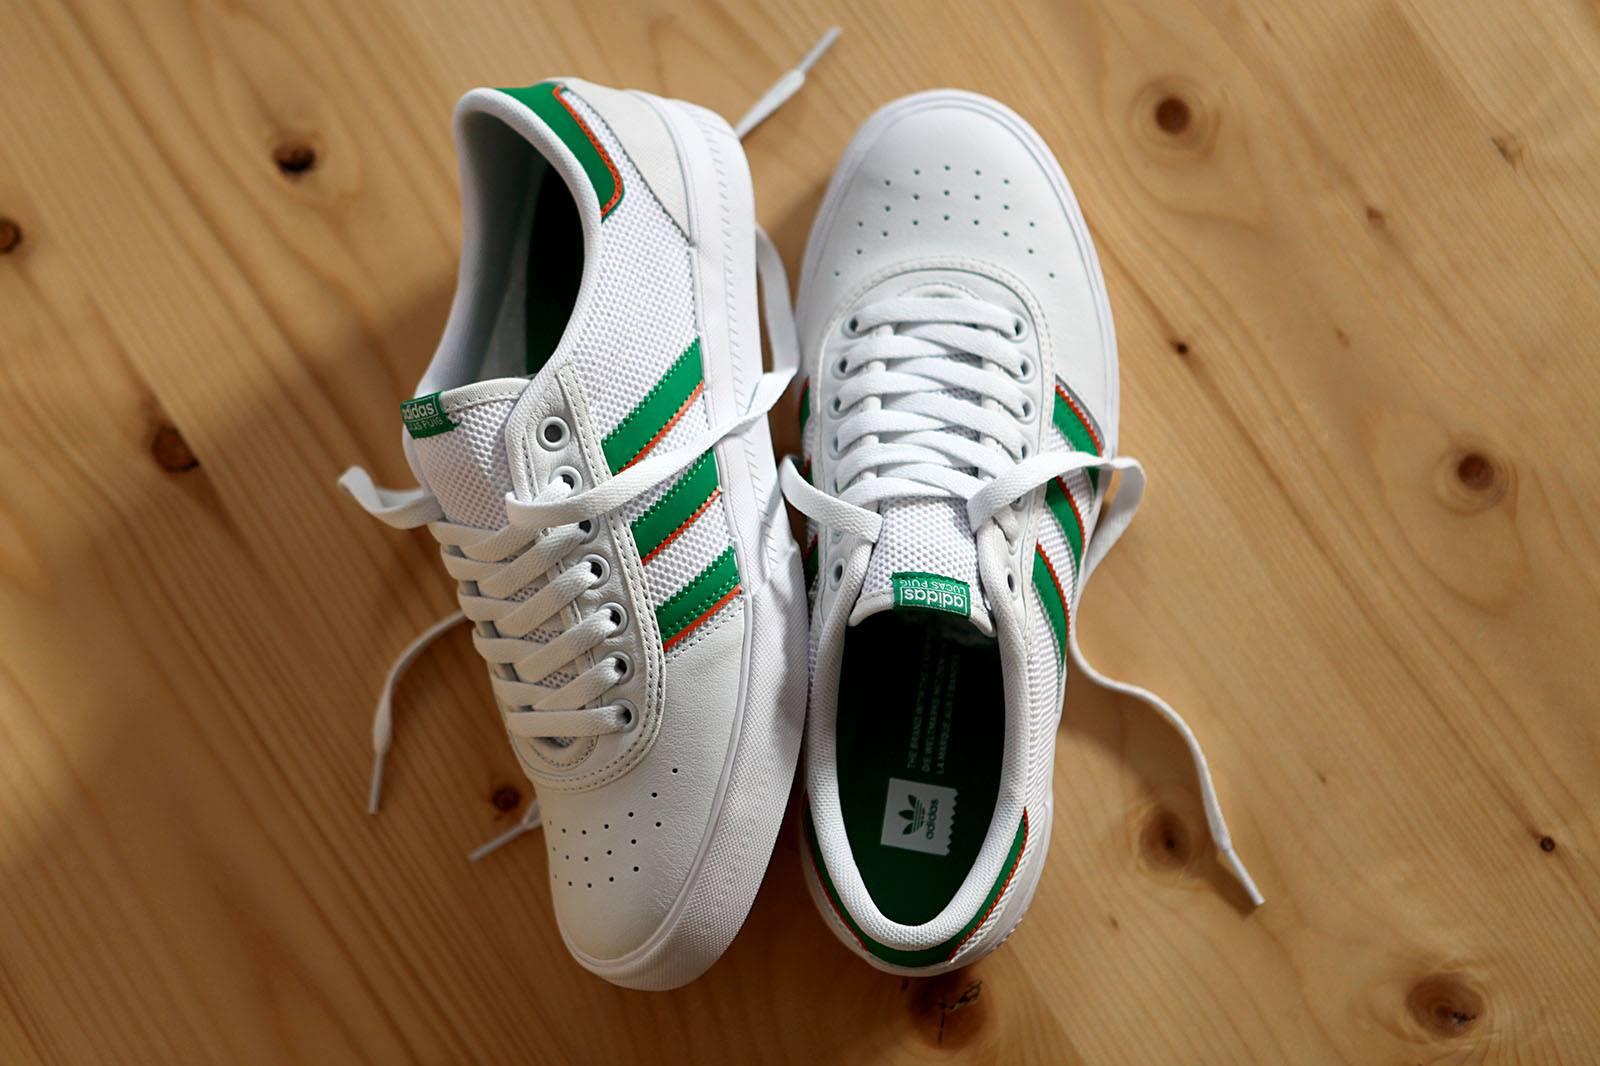 huge selection of 15436 71065 adidas-skateboarding-lucas-premiere-adv-white-green-popname